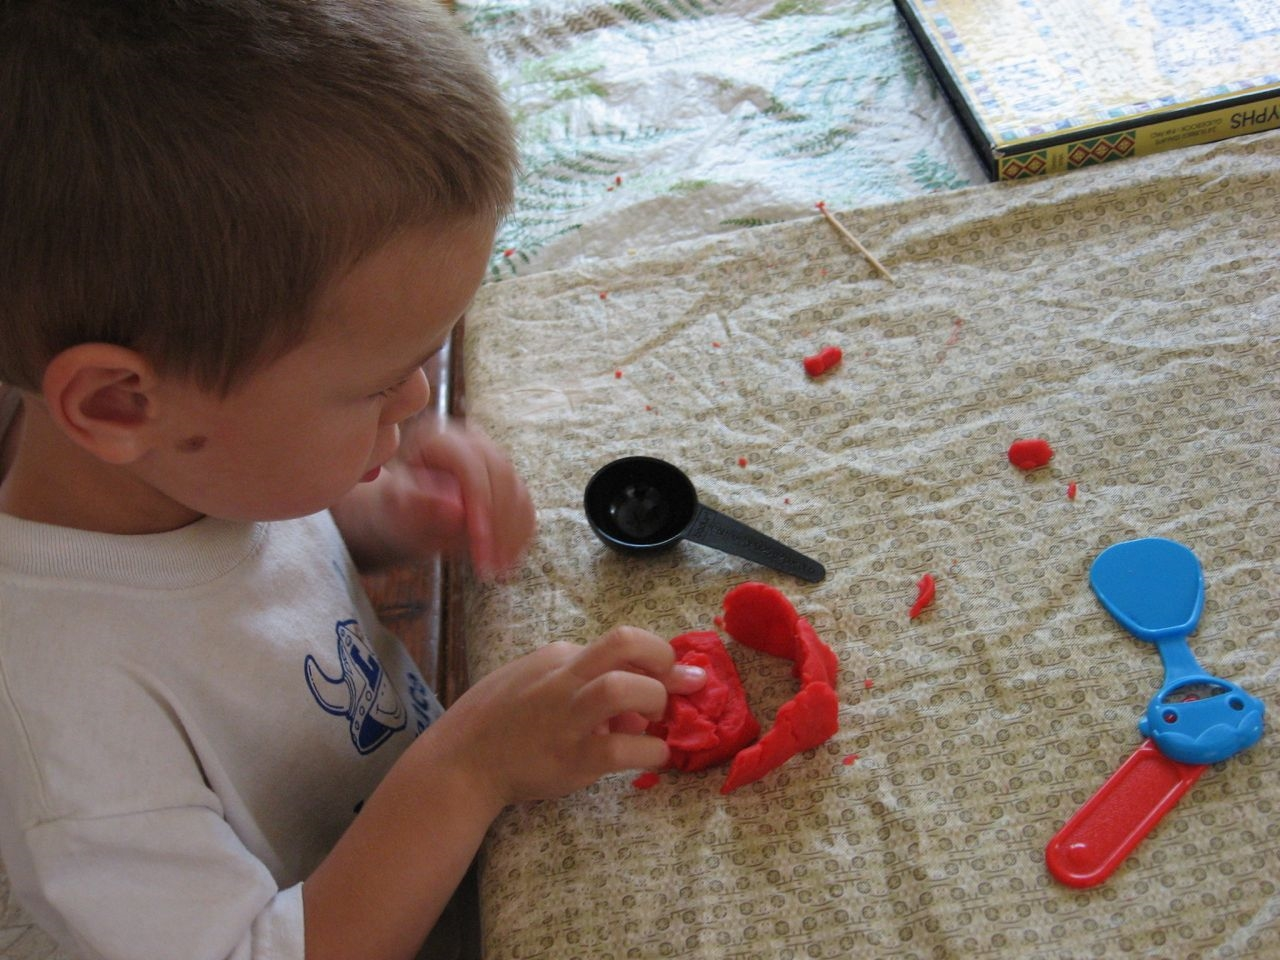 Play-doh the Philosopher